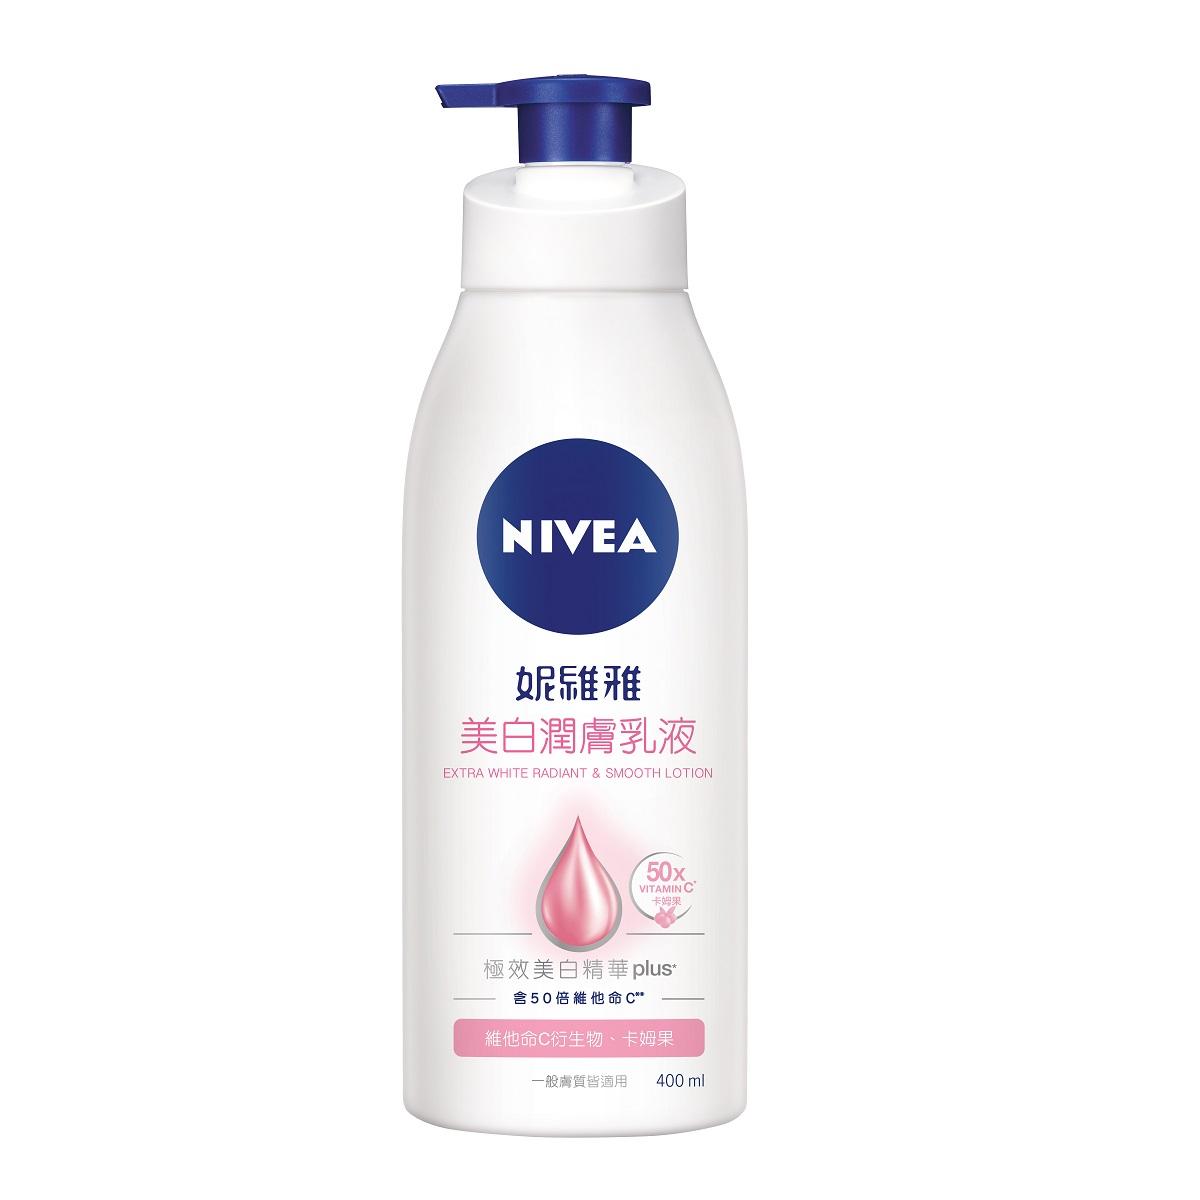 NIVEA妮維雅美白潤膚乳液400ml